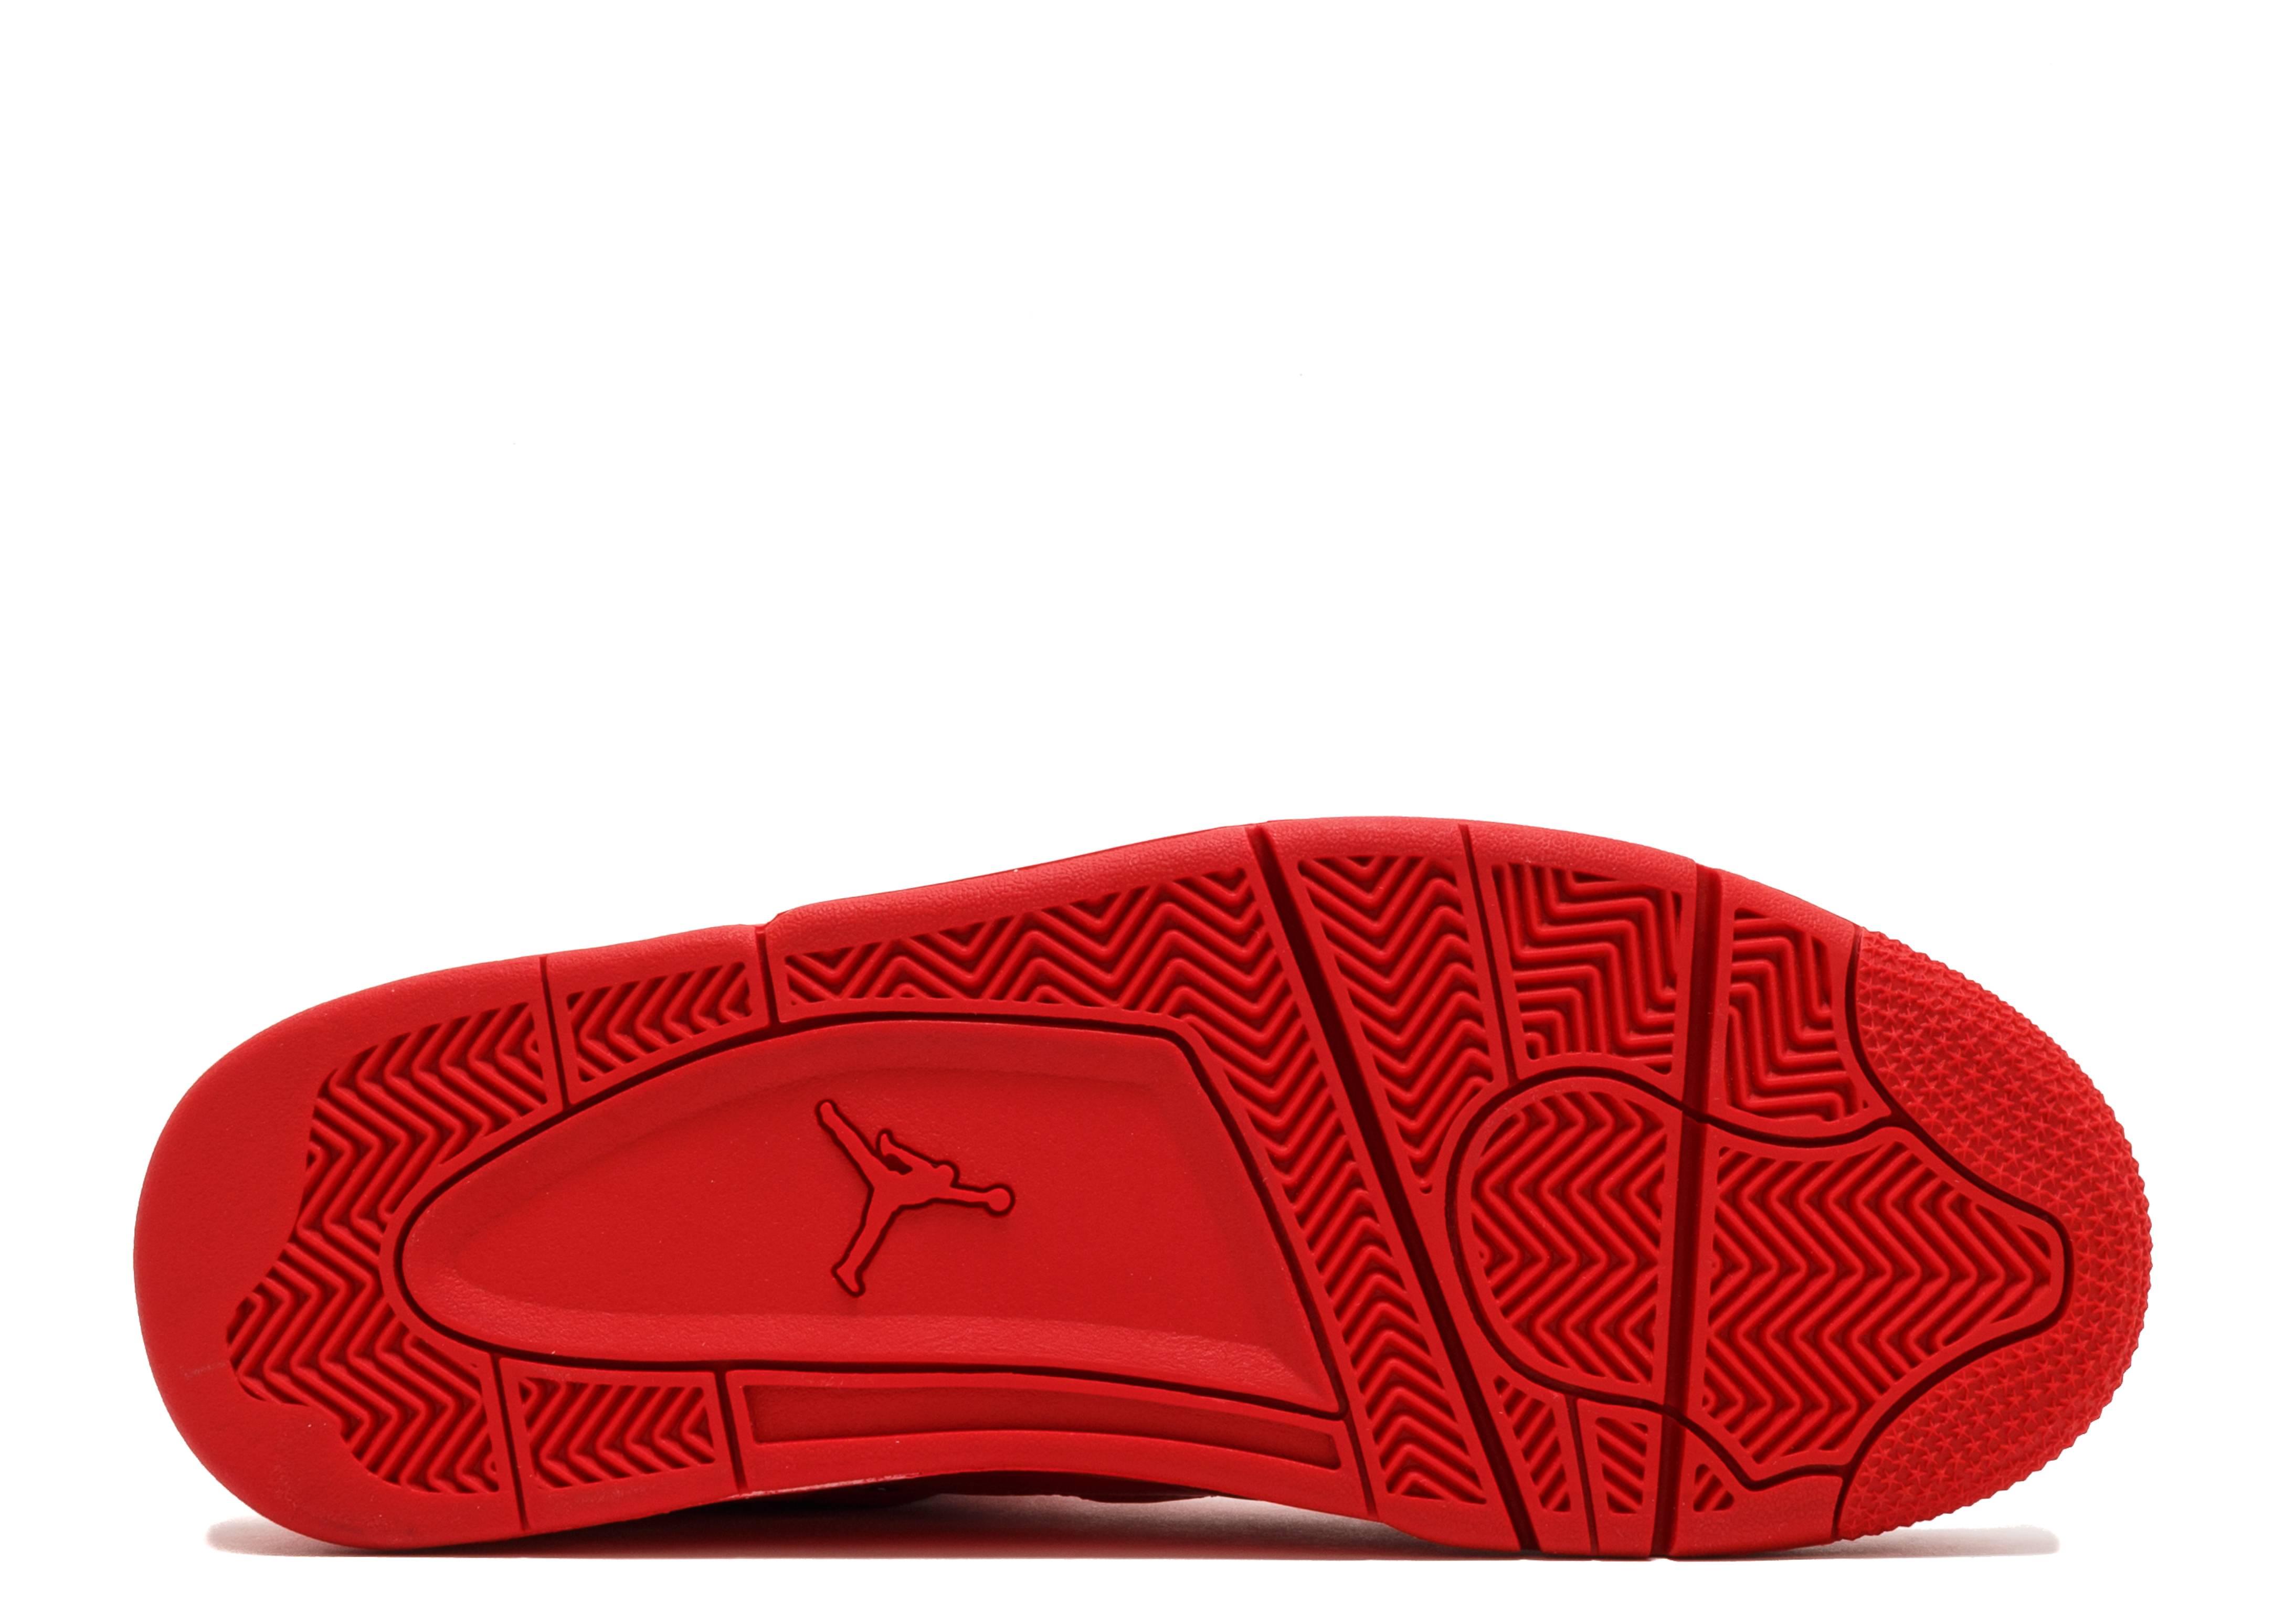 Air Jordan 11LAB4 'Red Patent Leather'